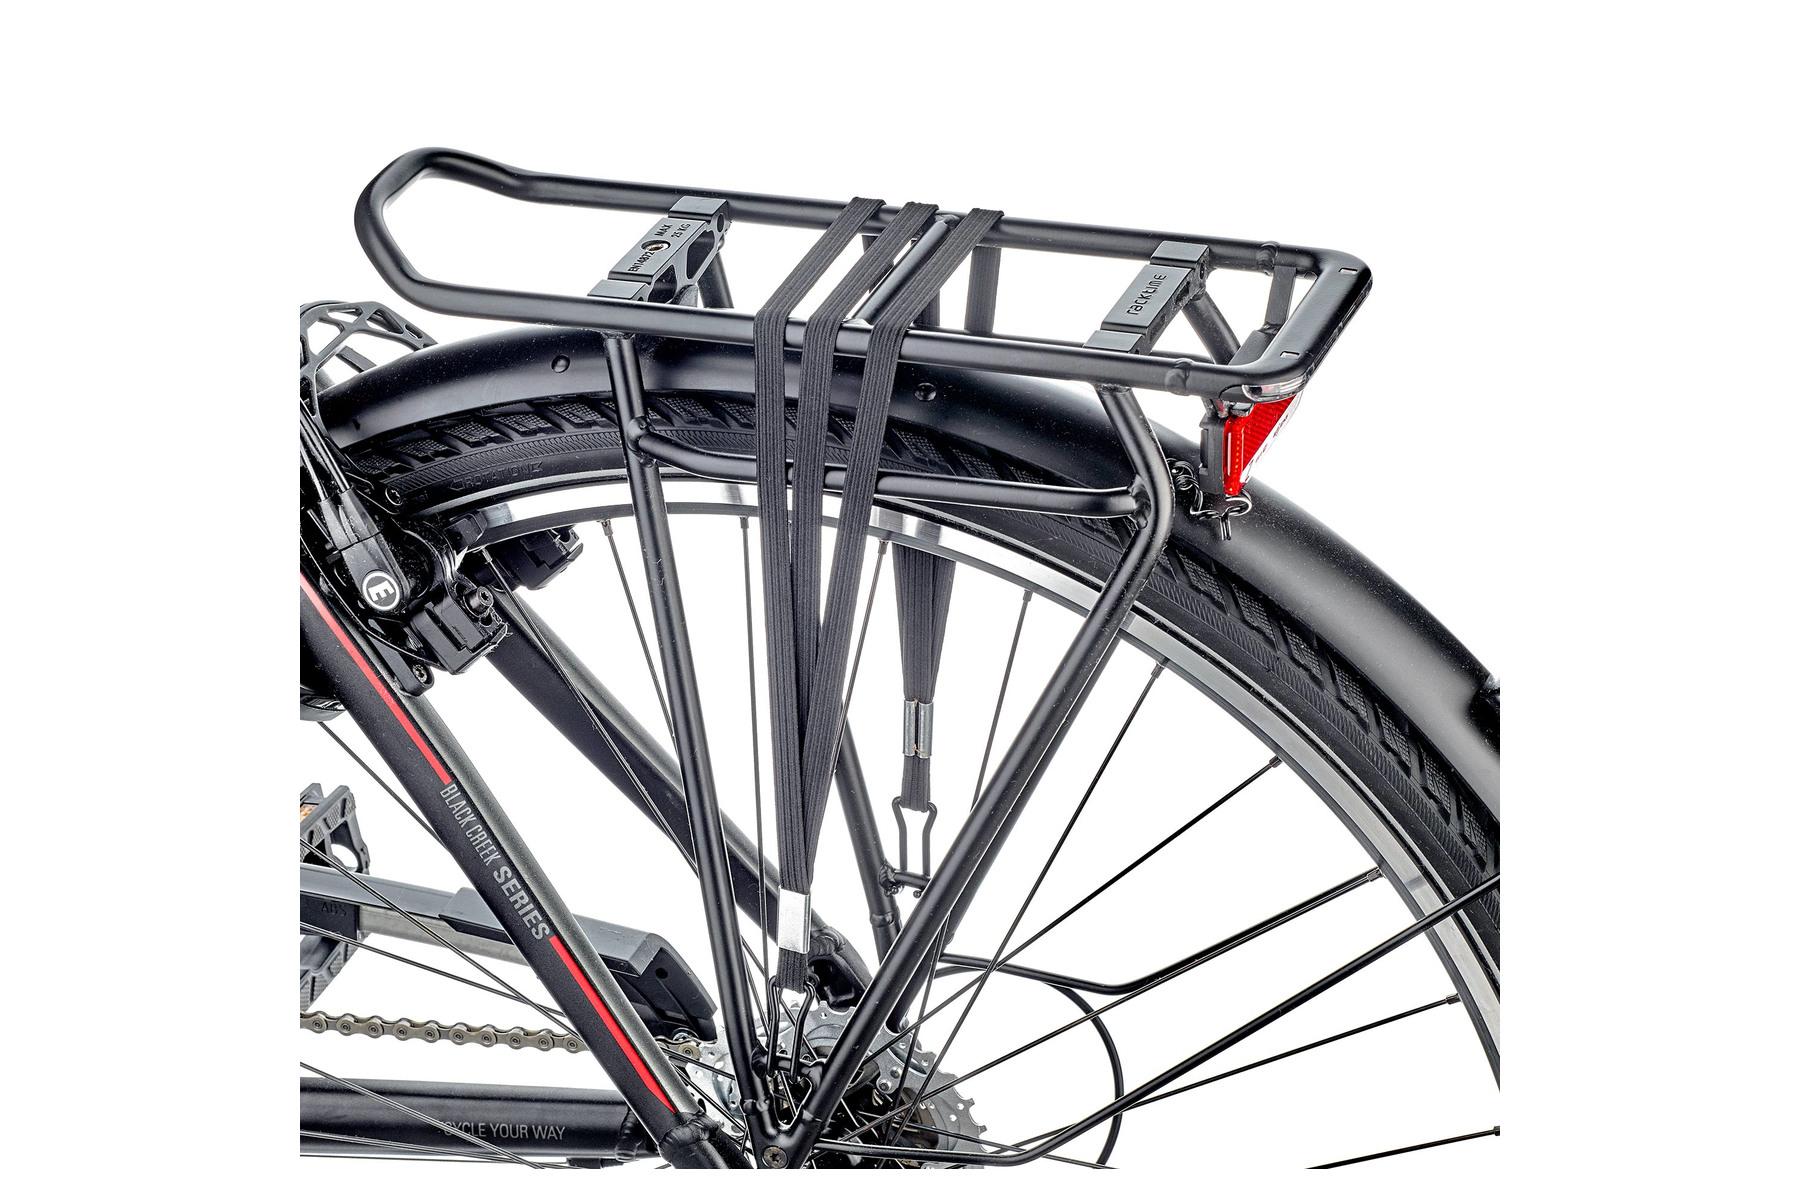 rose spanngummi mit haken kaufen rose bikes. Black Bedroom Furniture Sets. Home Design Ideas